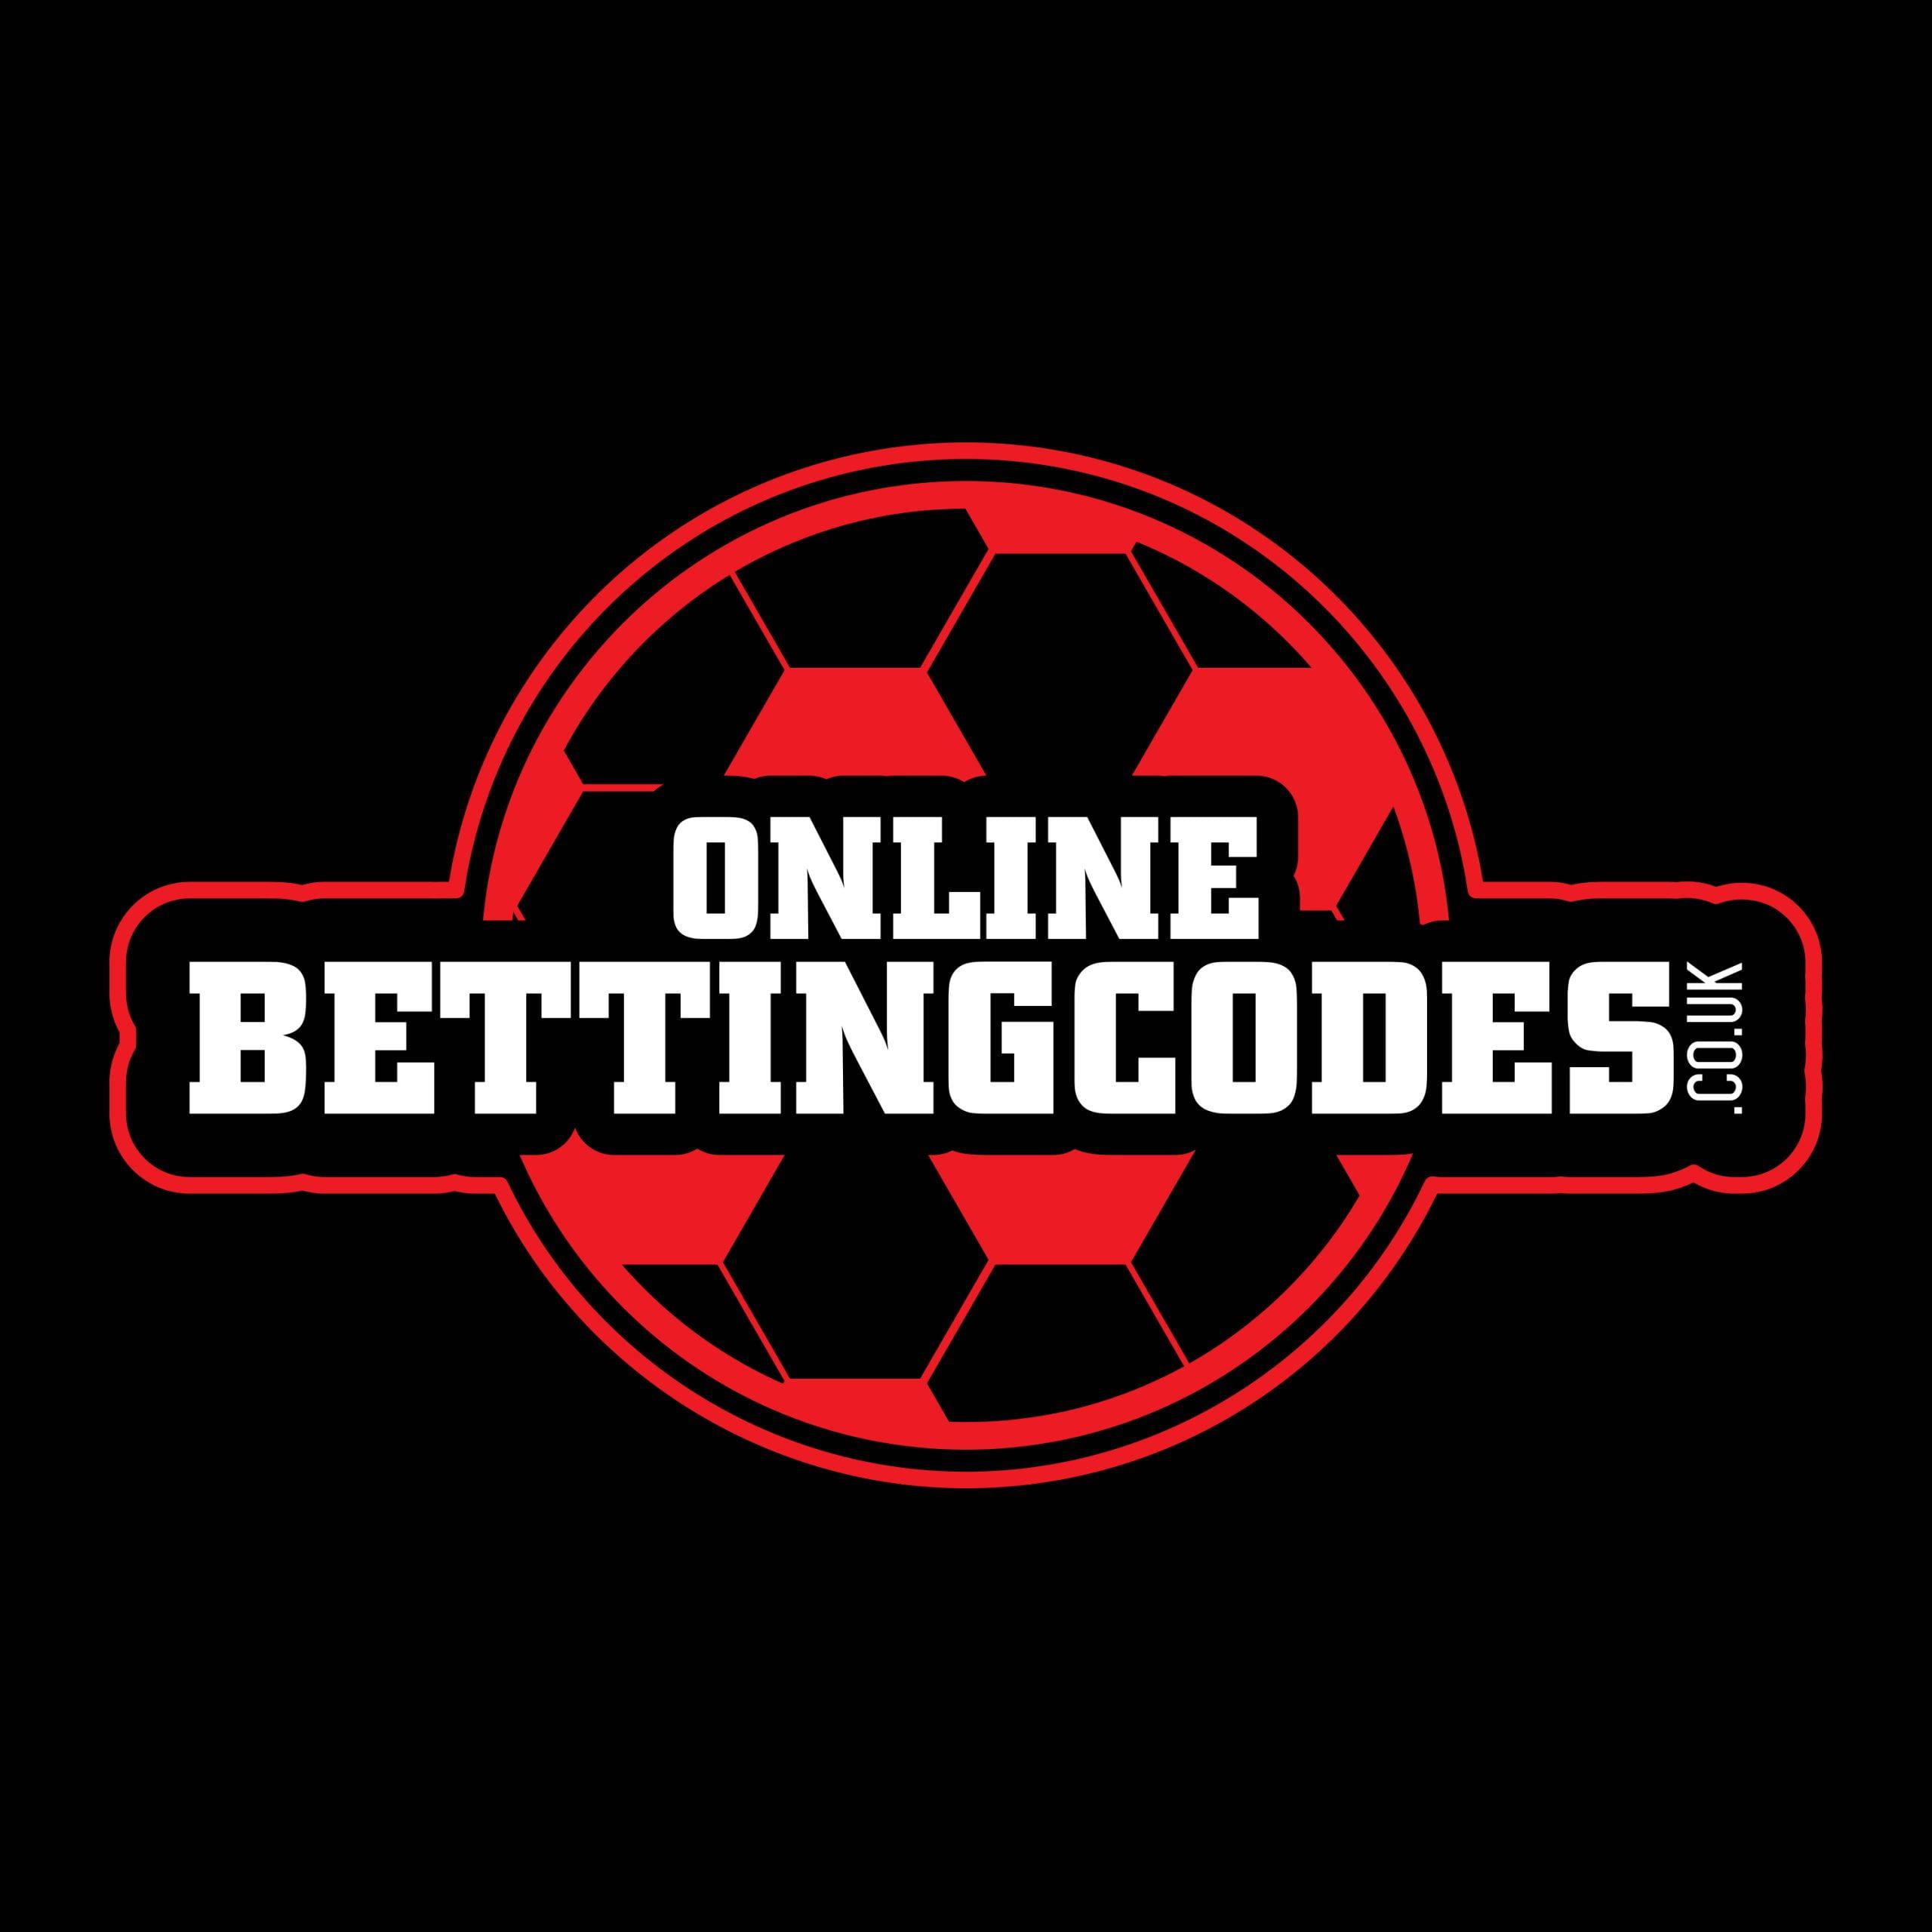 onlinebettingcodes